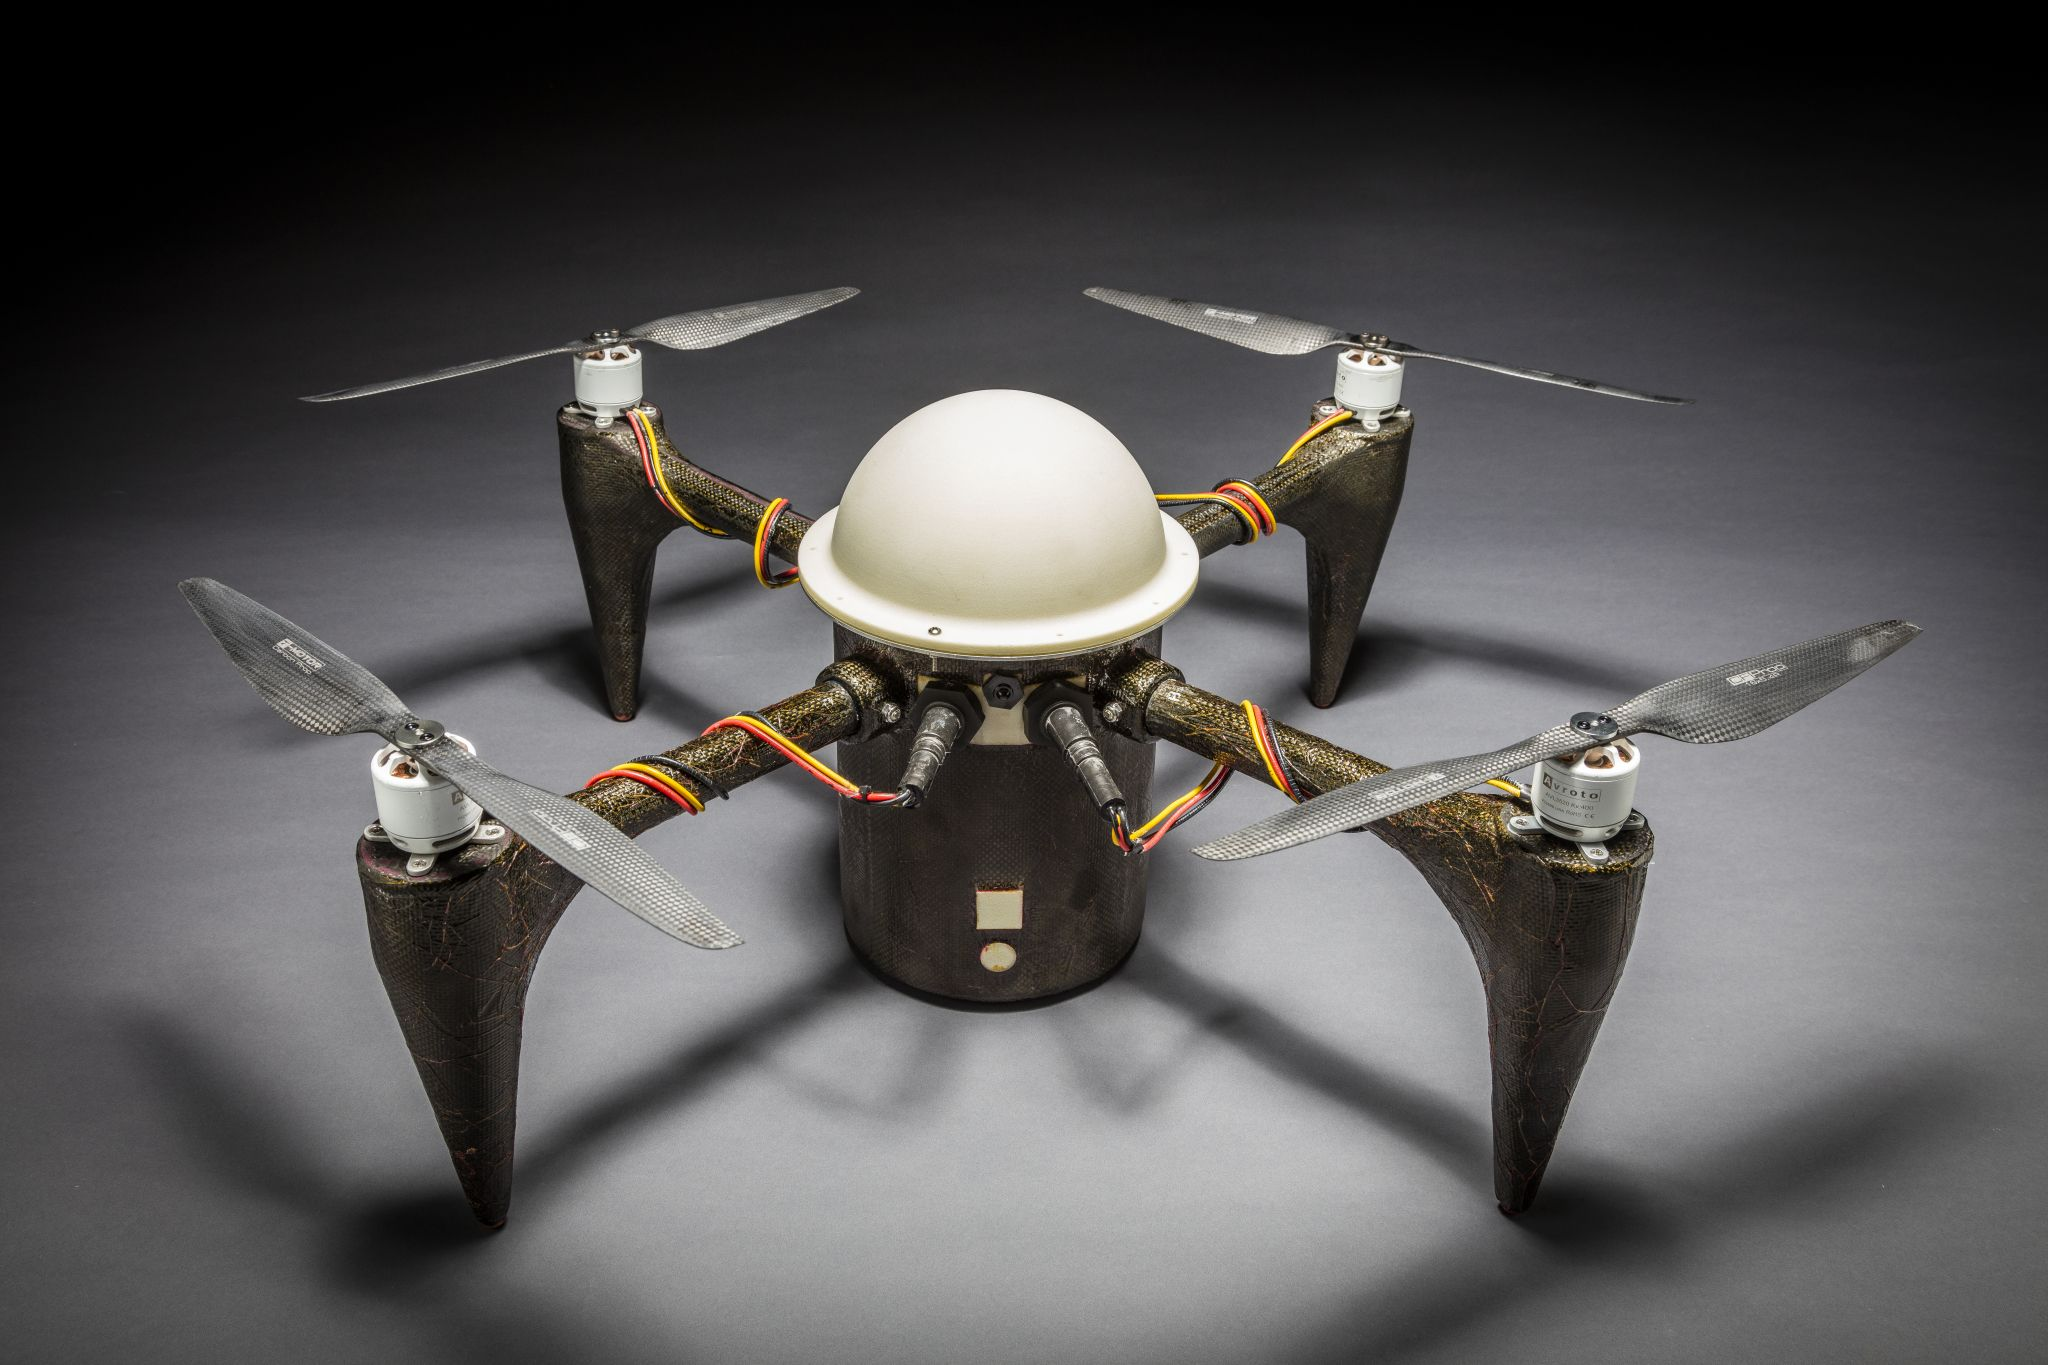 drone underwater john hopkins avroto